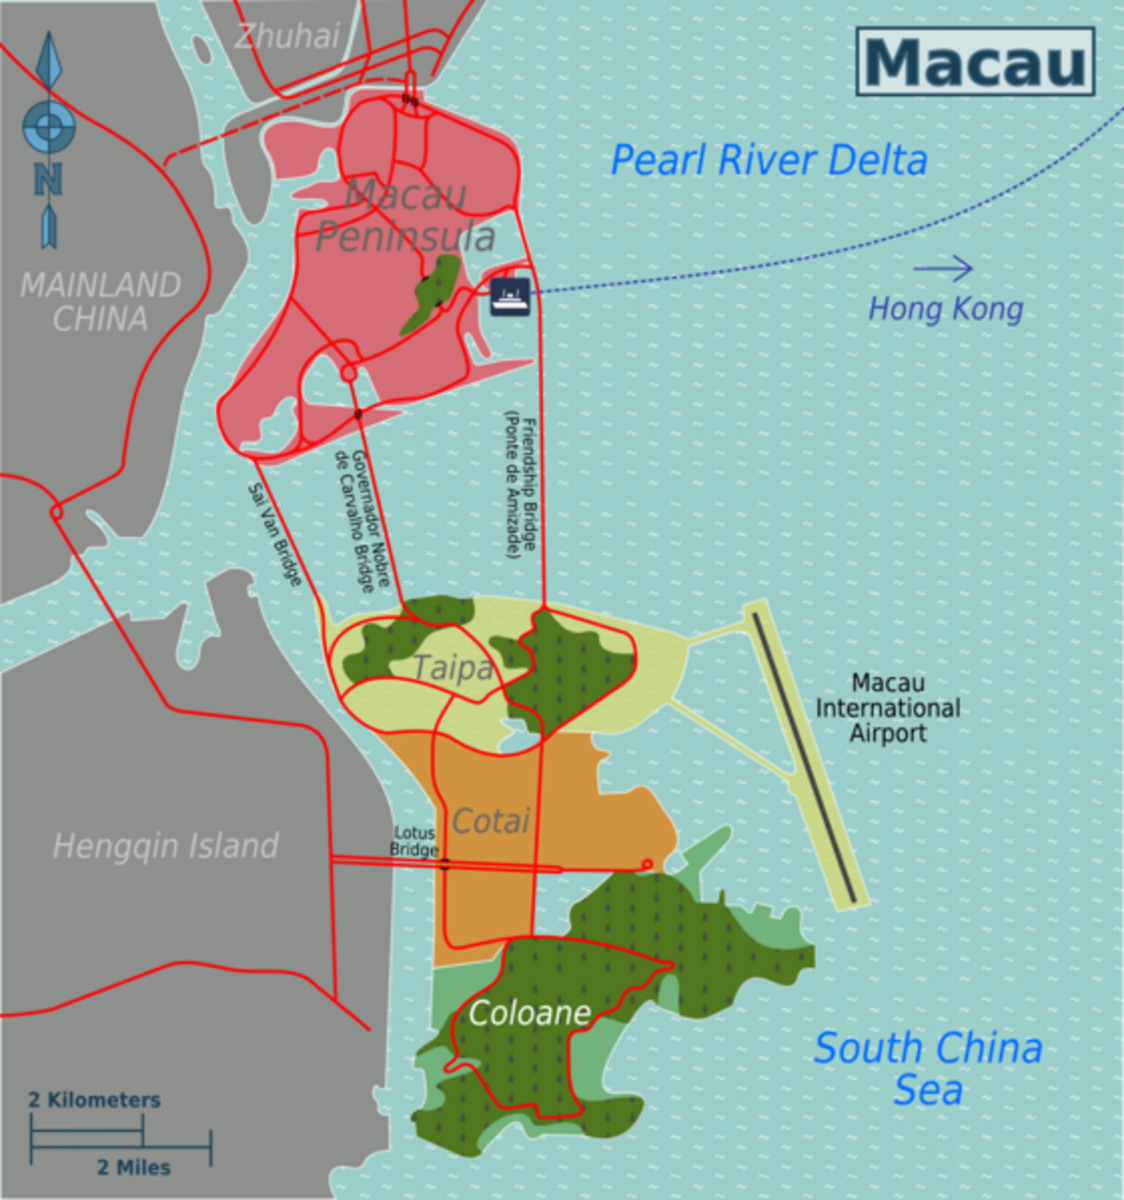 macau-travel-tips